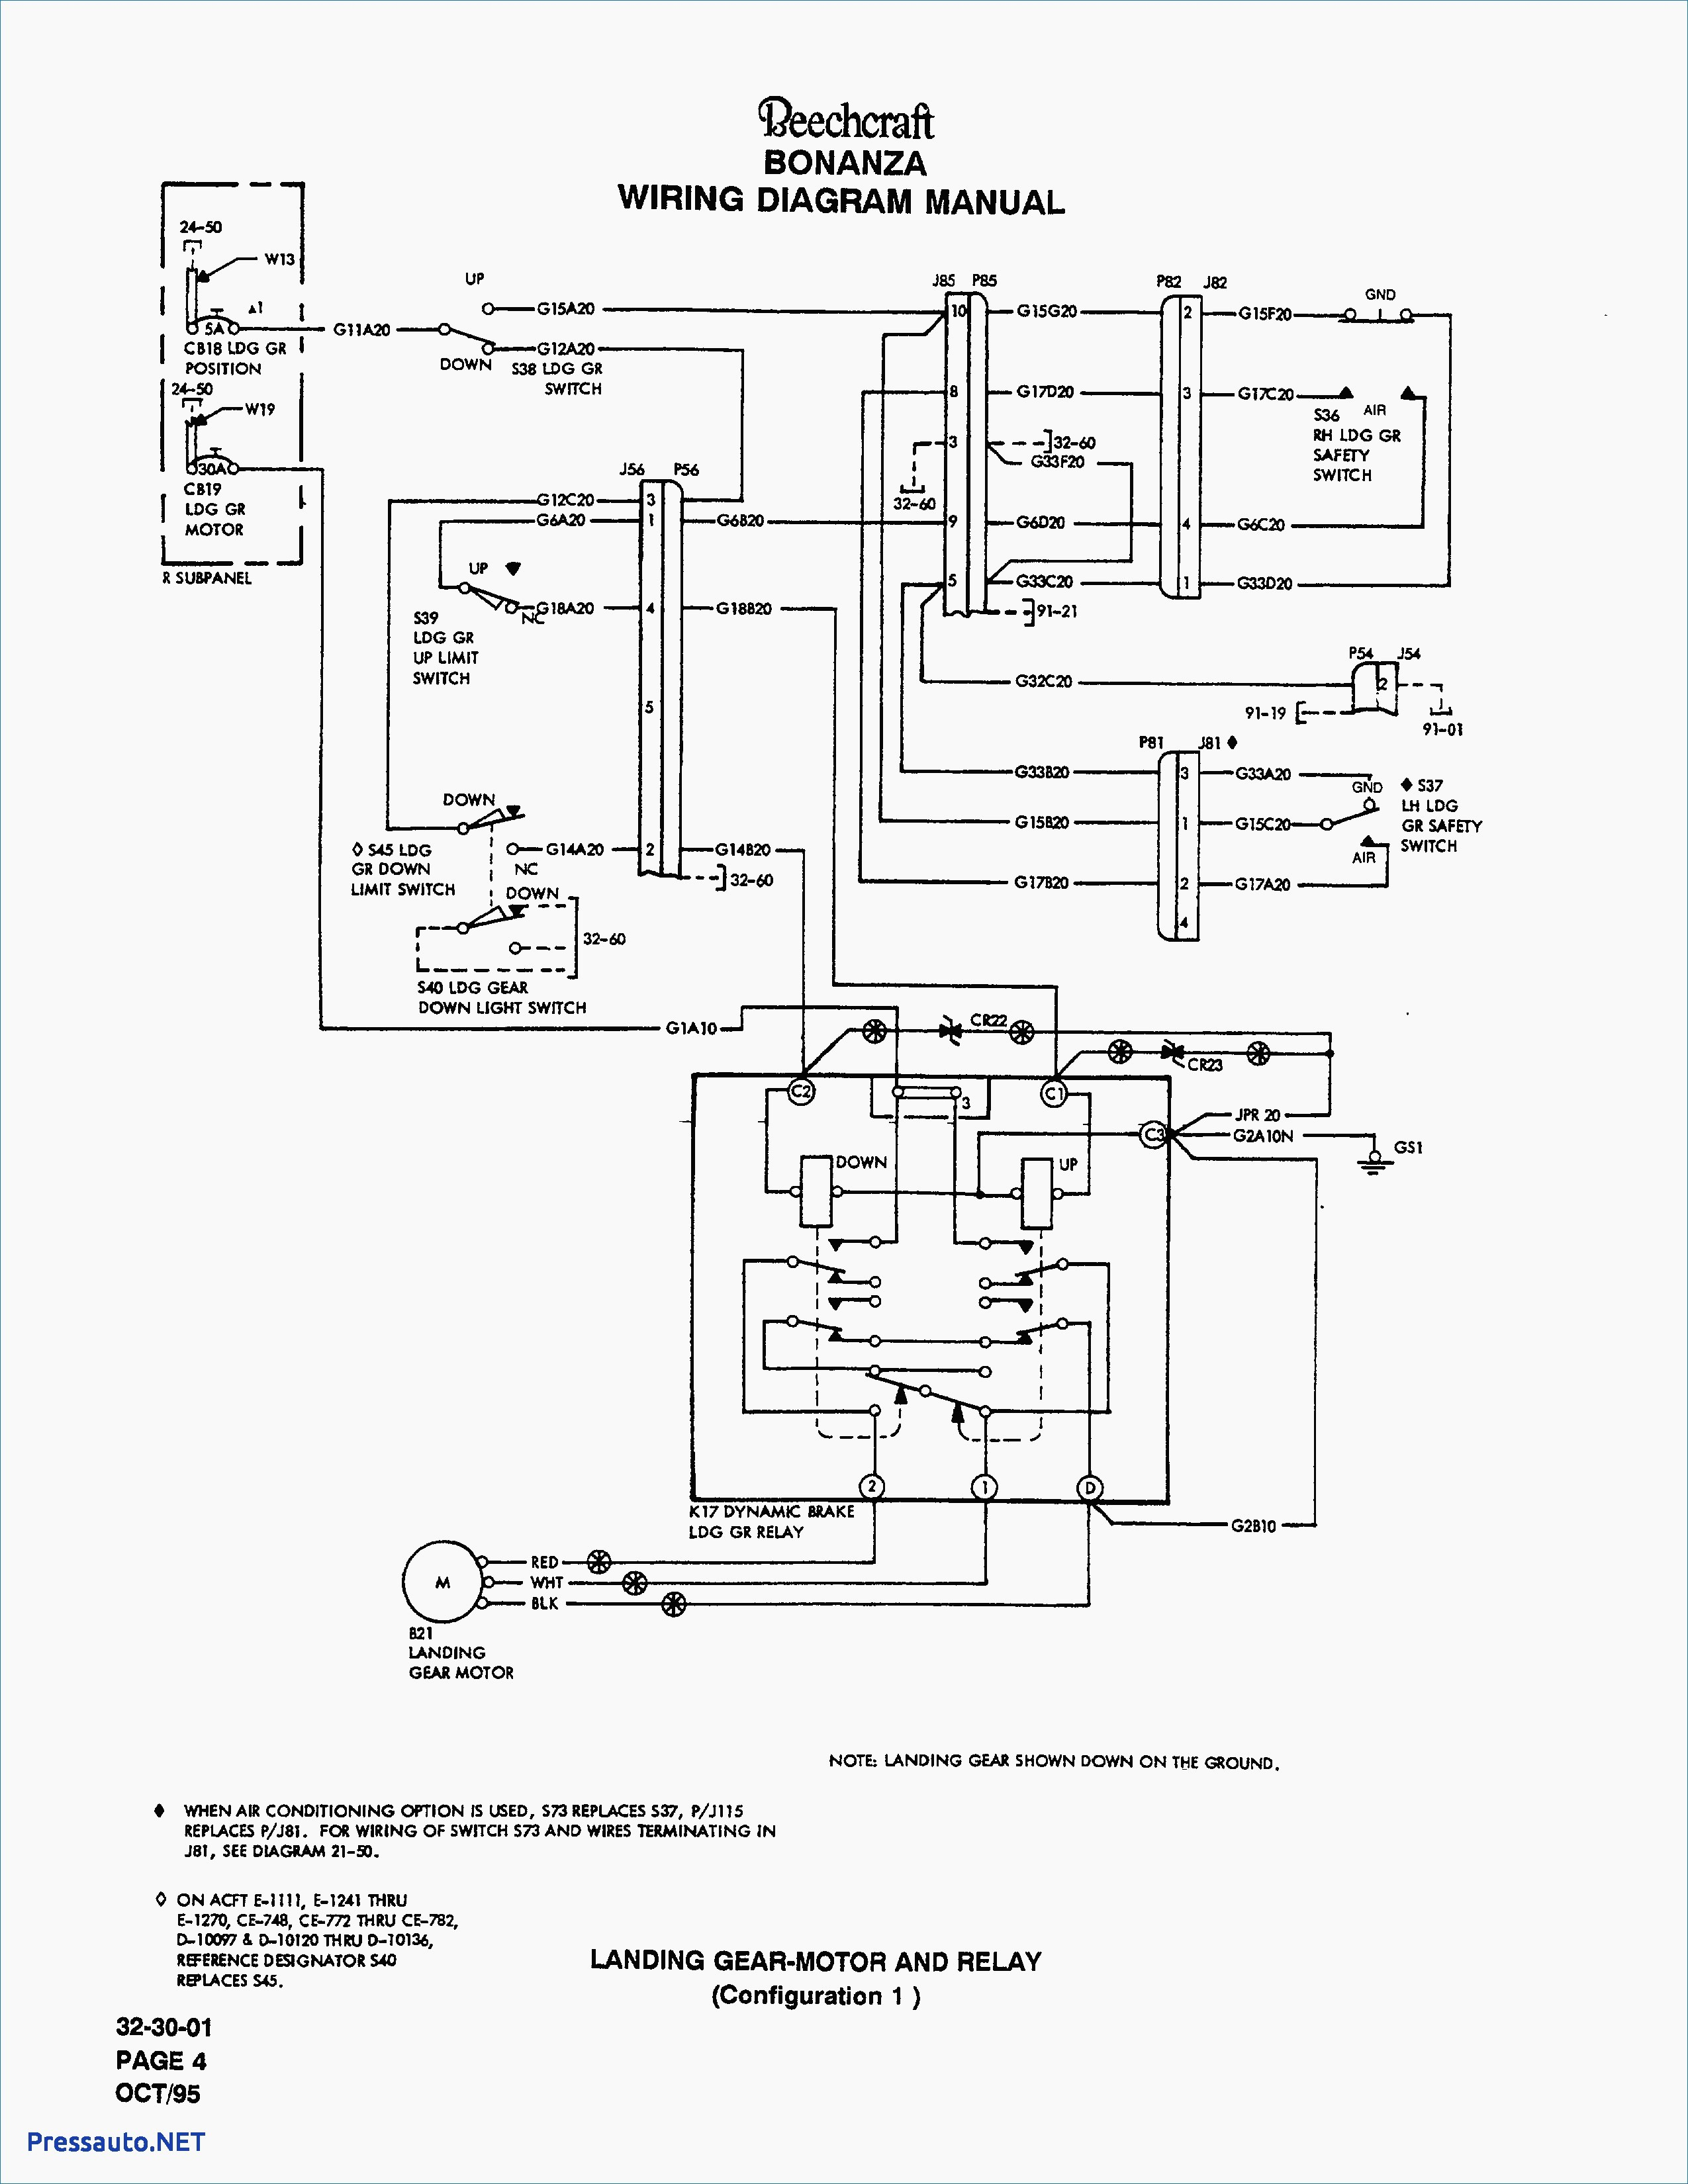 Fisher joystick wiring diagram wiring library western plow isolation module schematics fisher minute mount 2 wiring